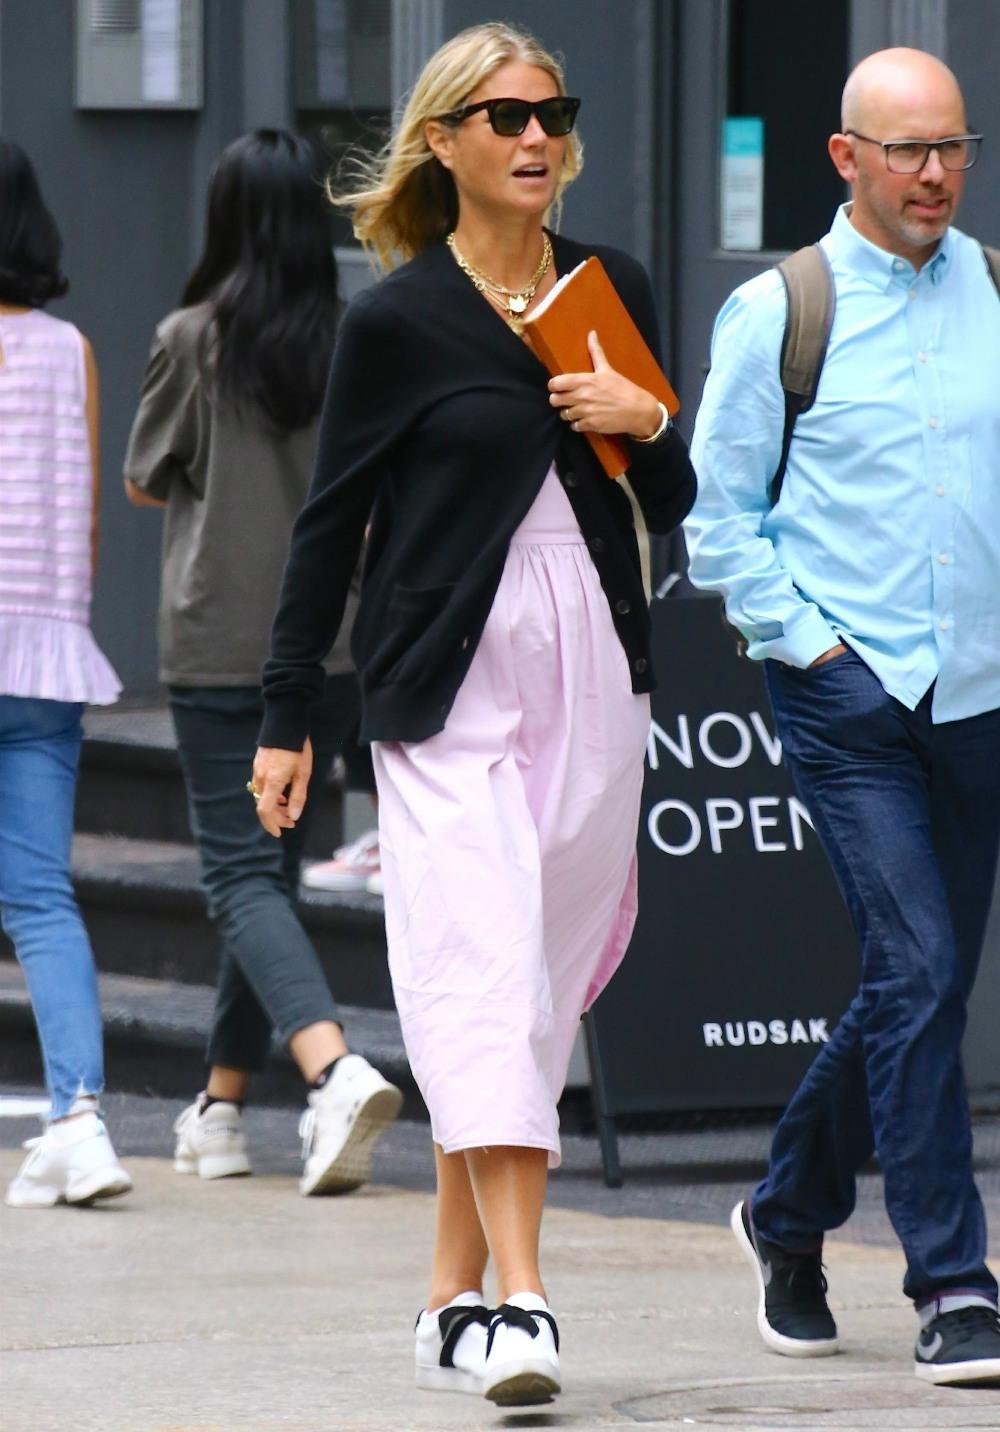 Gwyneth Paltrow walks with a friend on Prince Street in Soho, New York